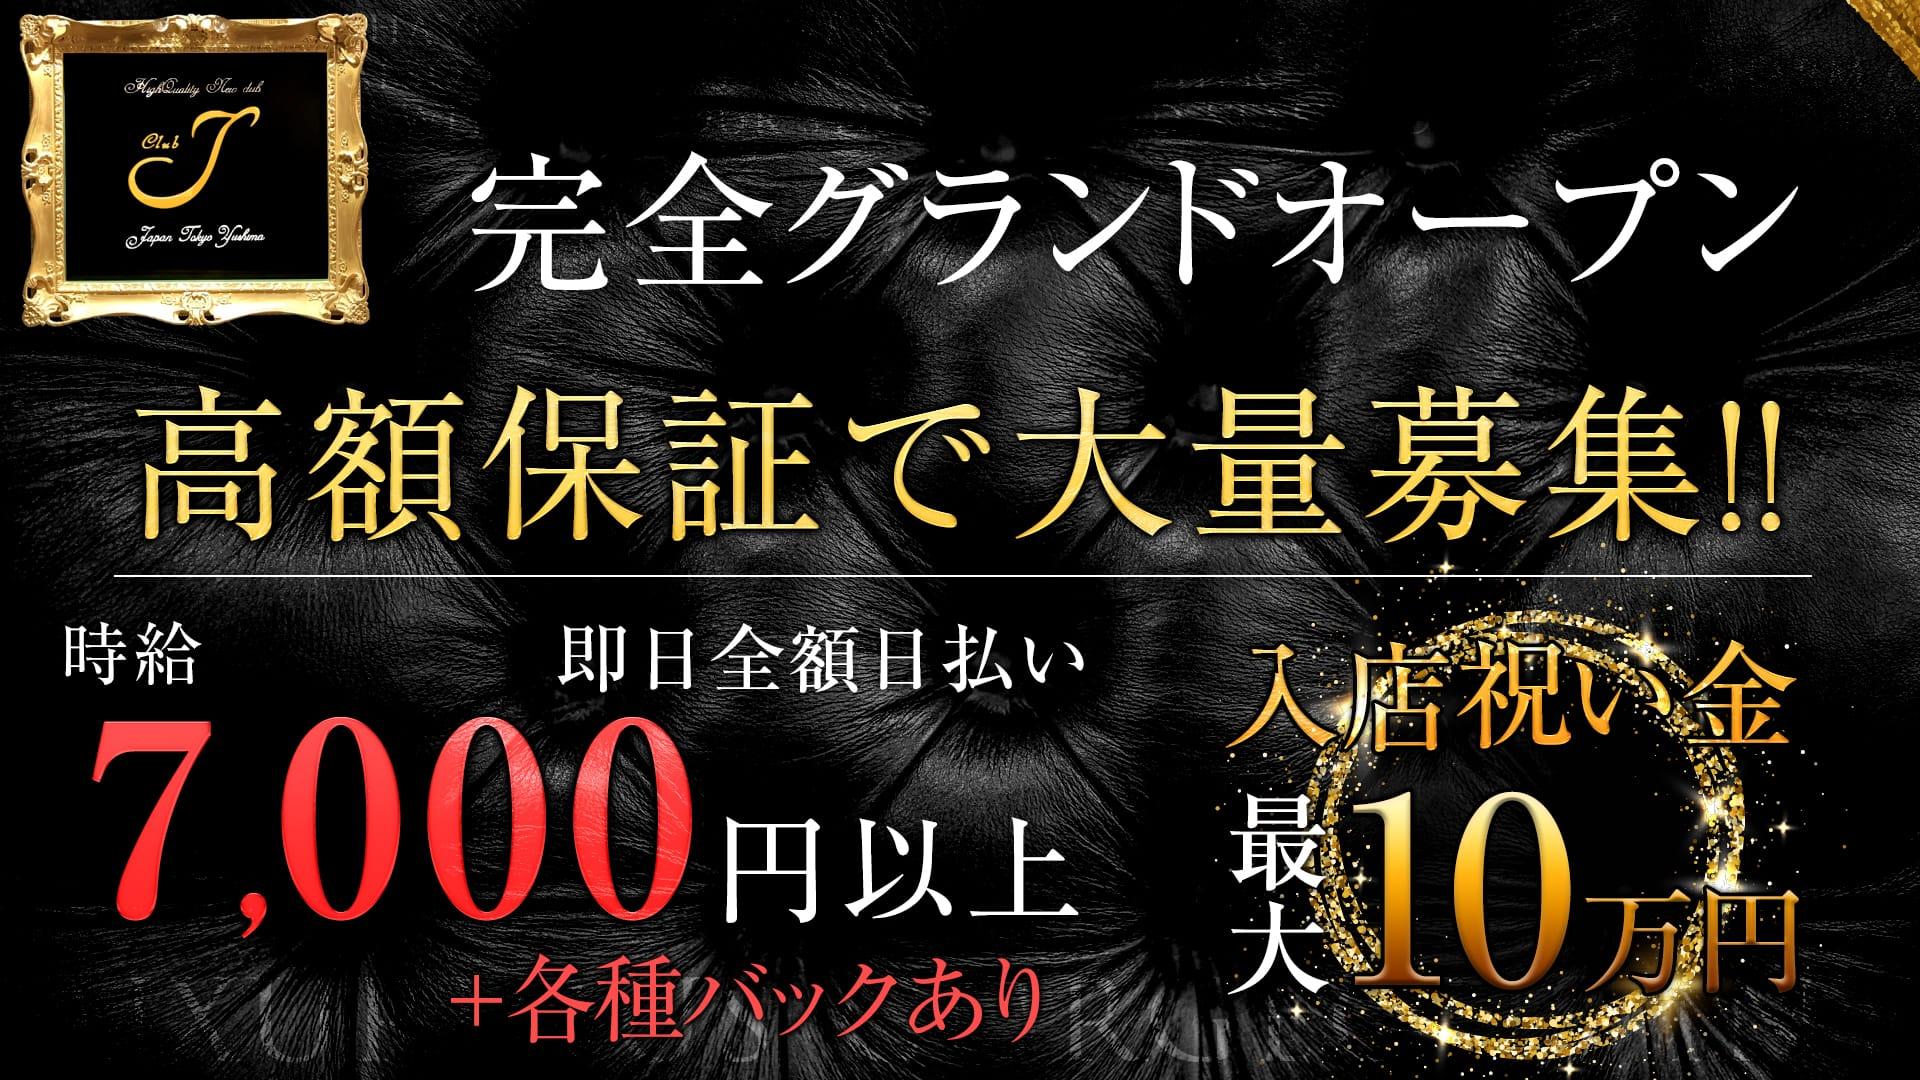 CLUB J(クラブジェイ) 上野キャバクラ TOP画像